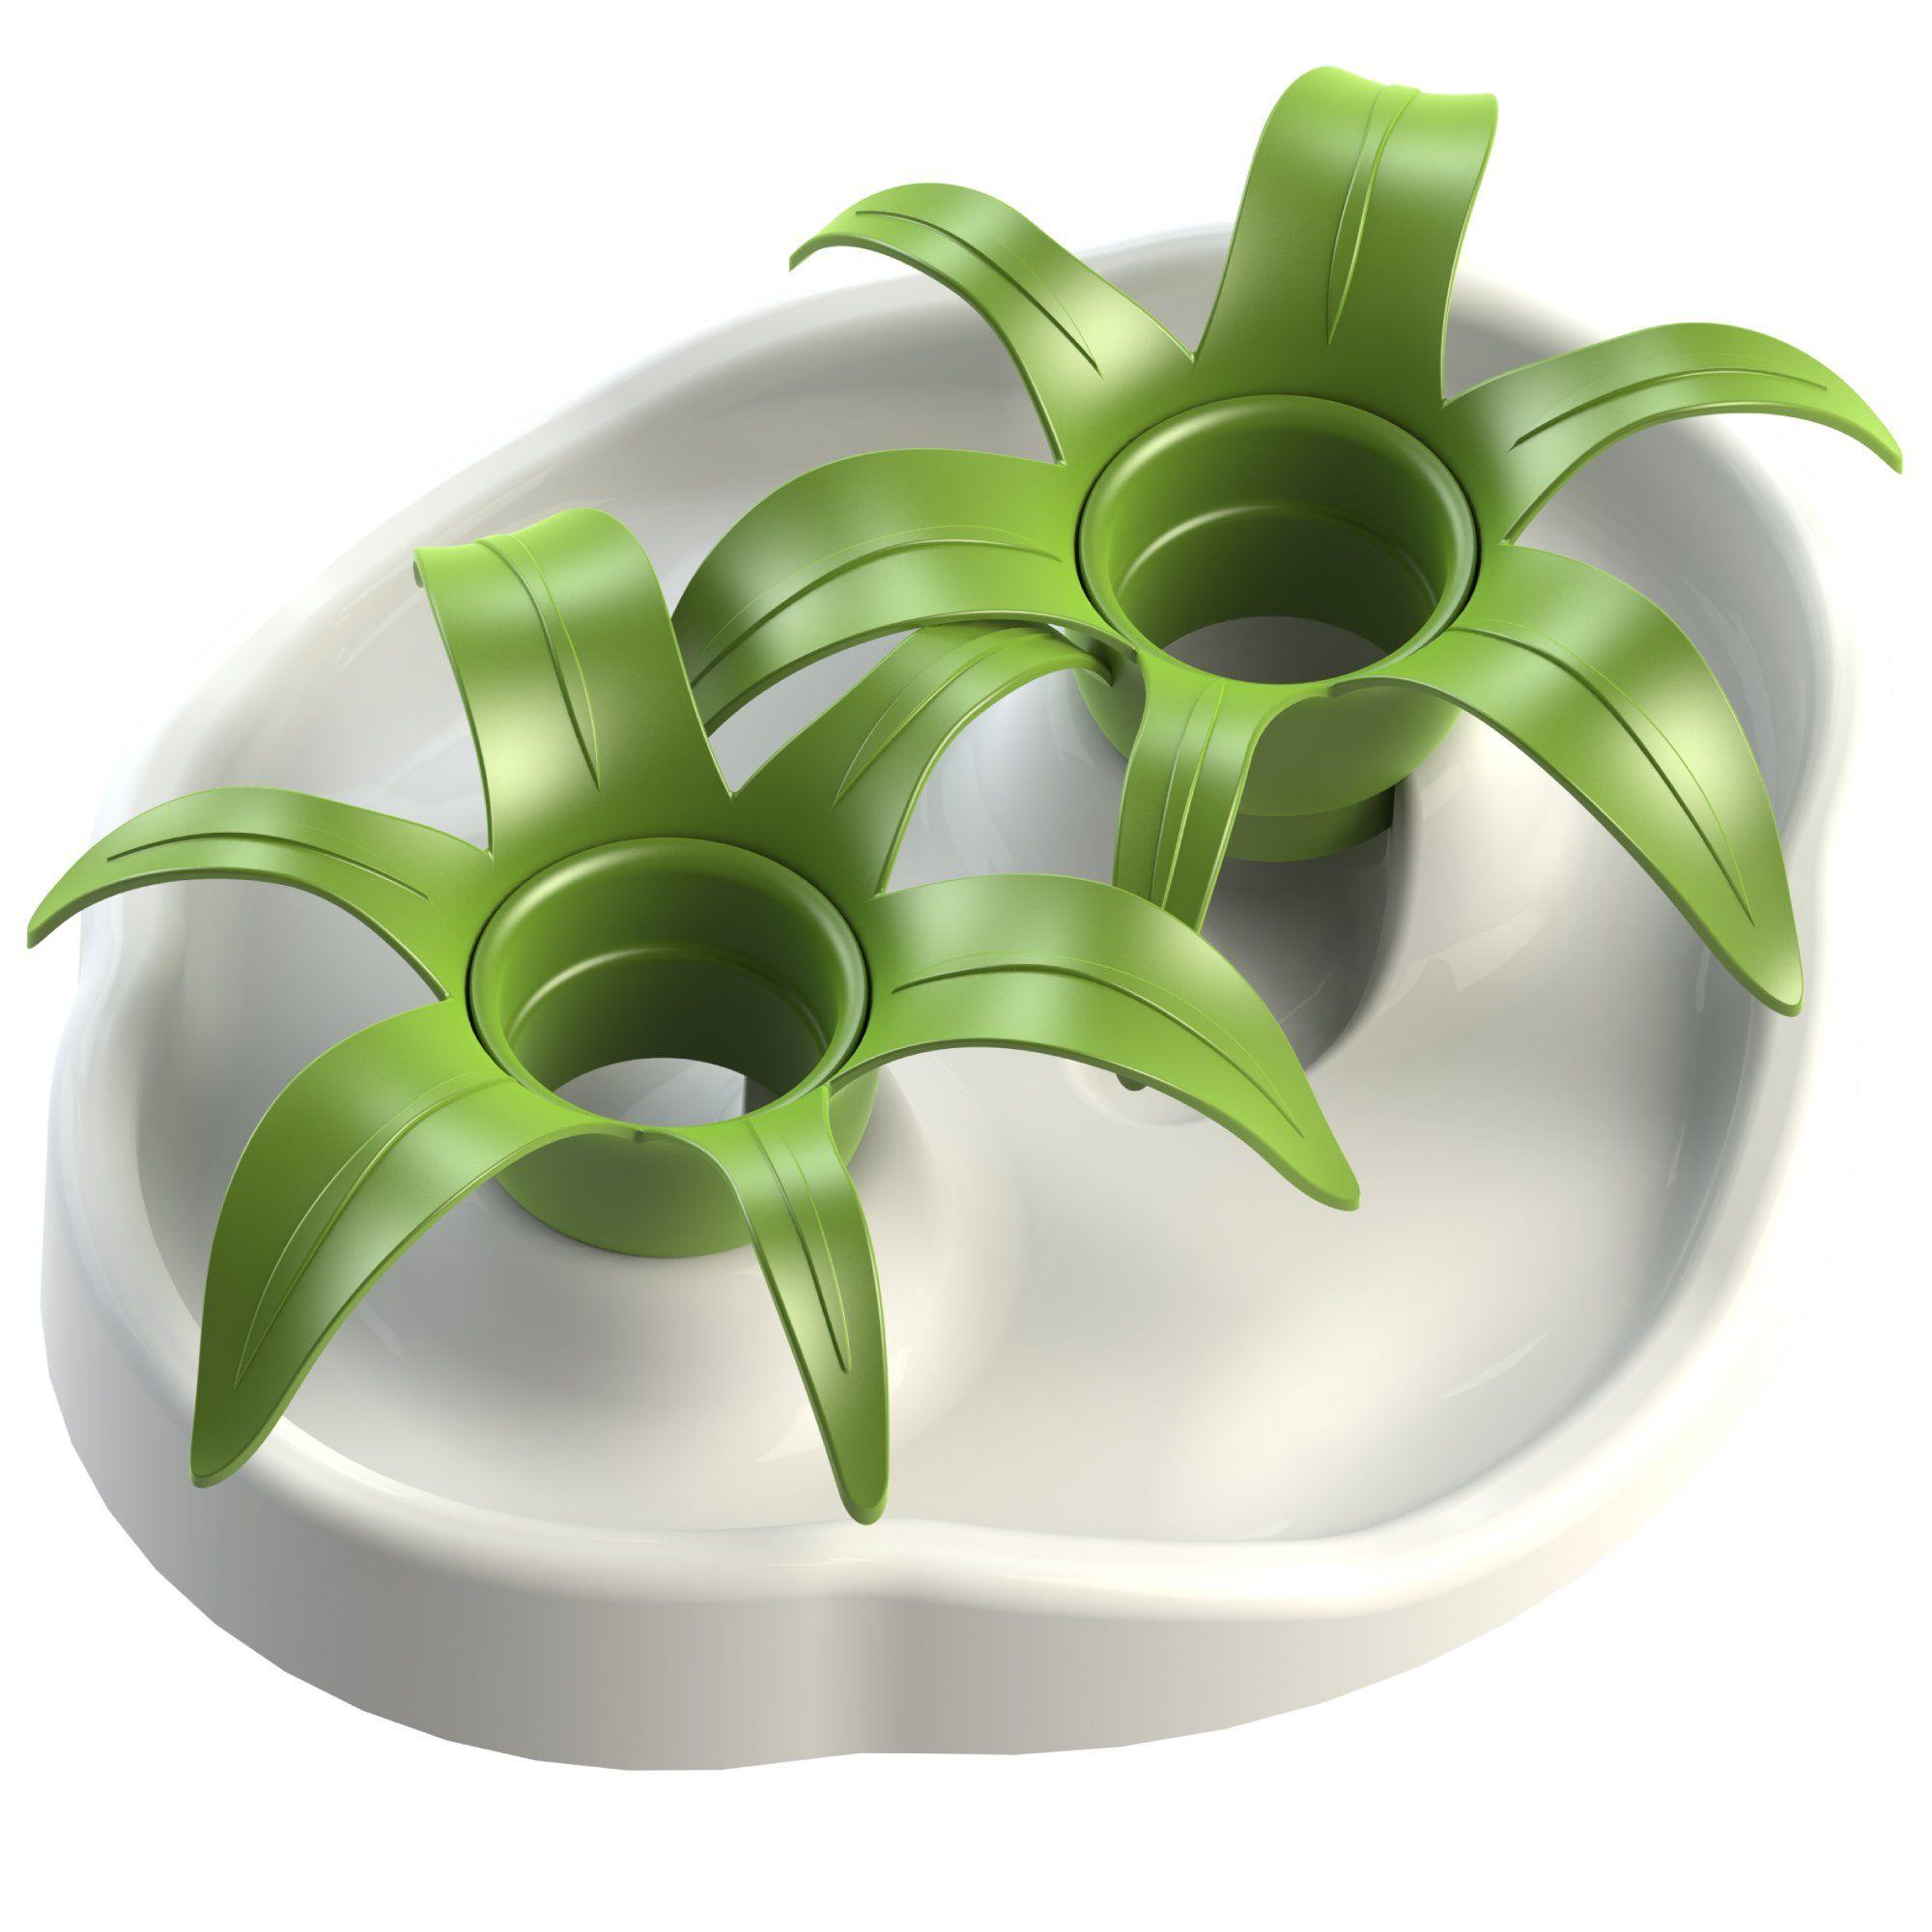 AÃ KIOU Thin Kat Interactive Cat Bowl Slow Feed Flower